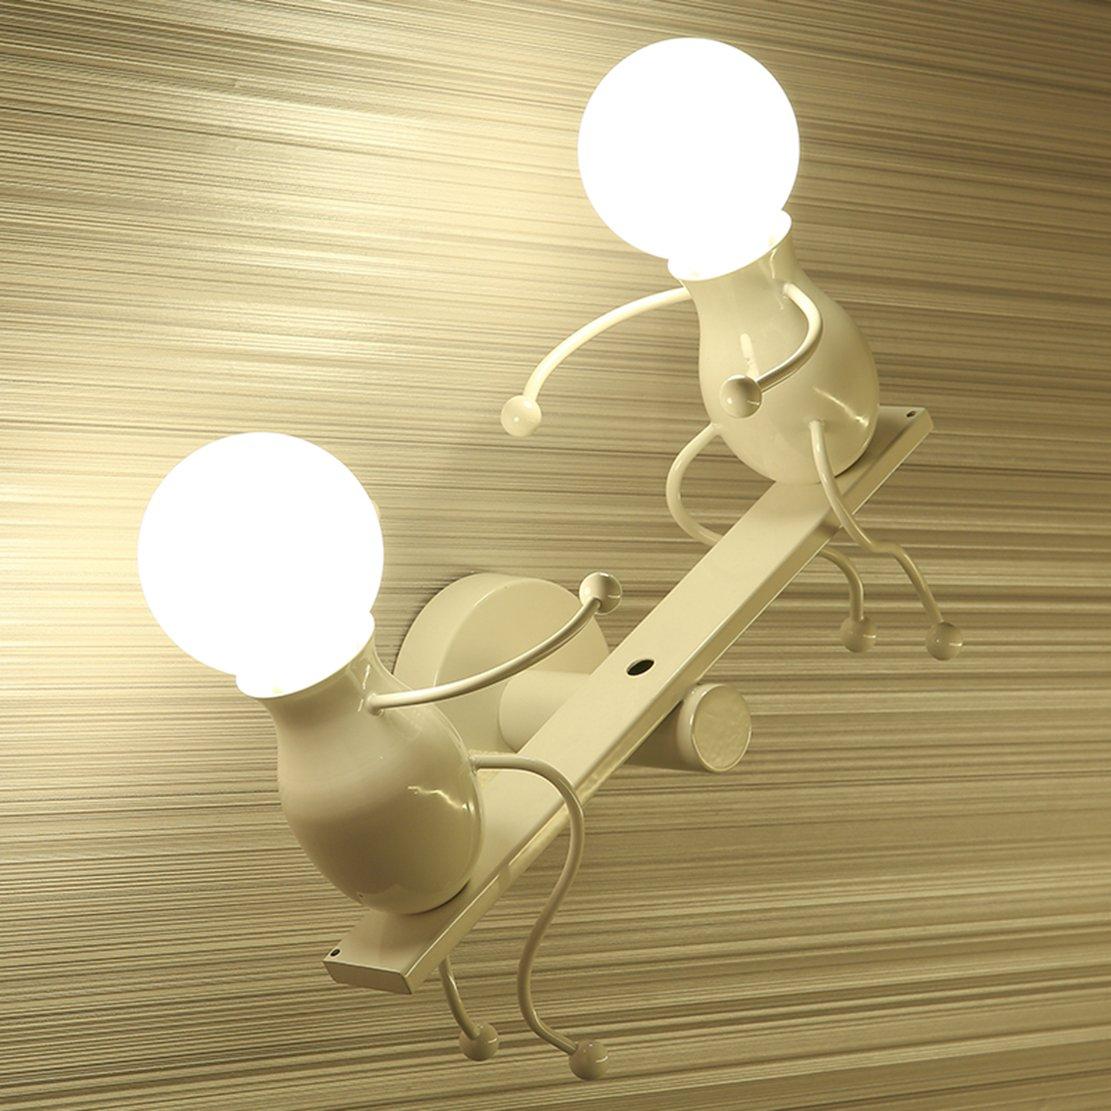 Contemporary Modern Wall Lamp: Amazon.com